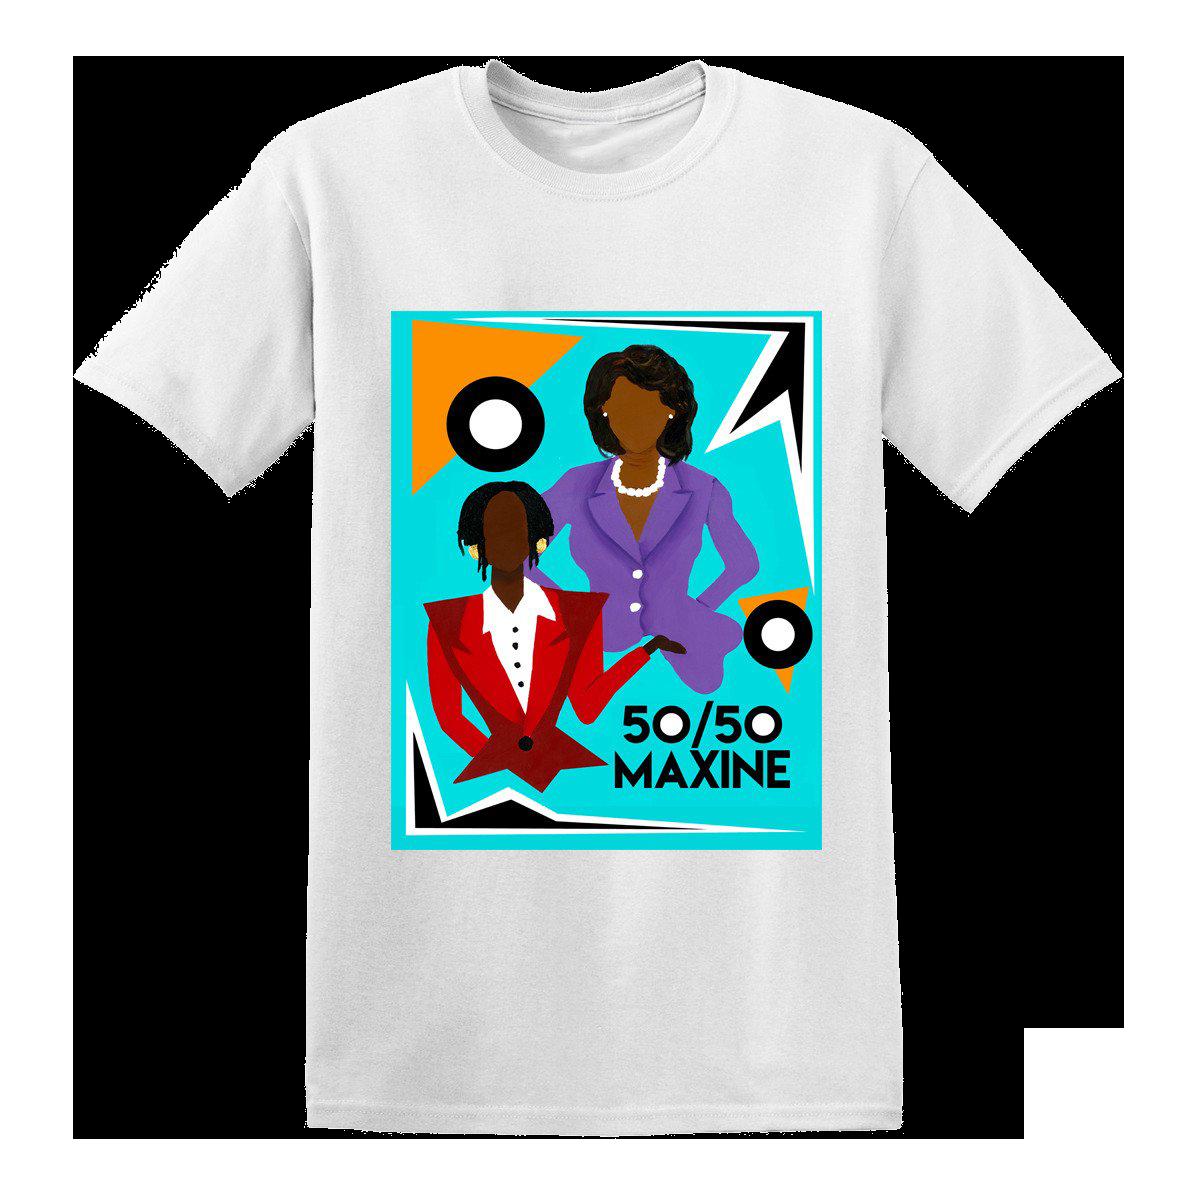 50/50 Maxine T-Shirt [White]